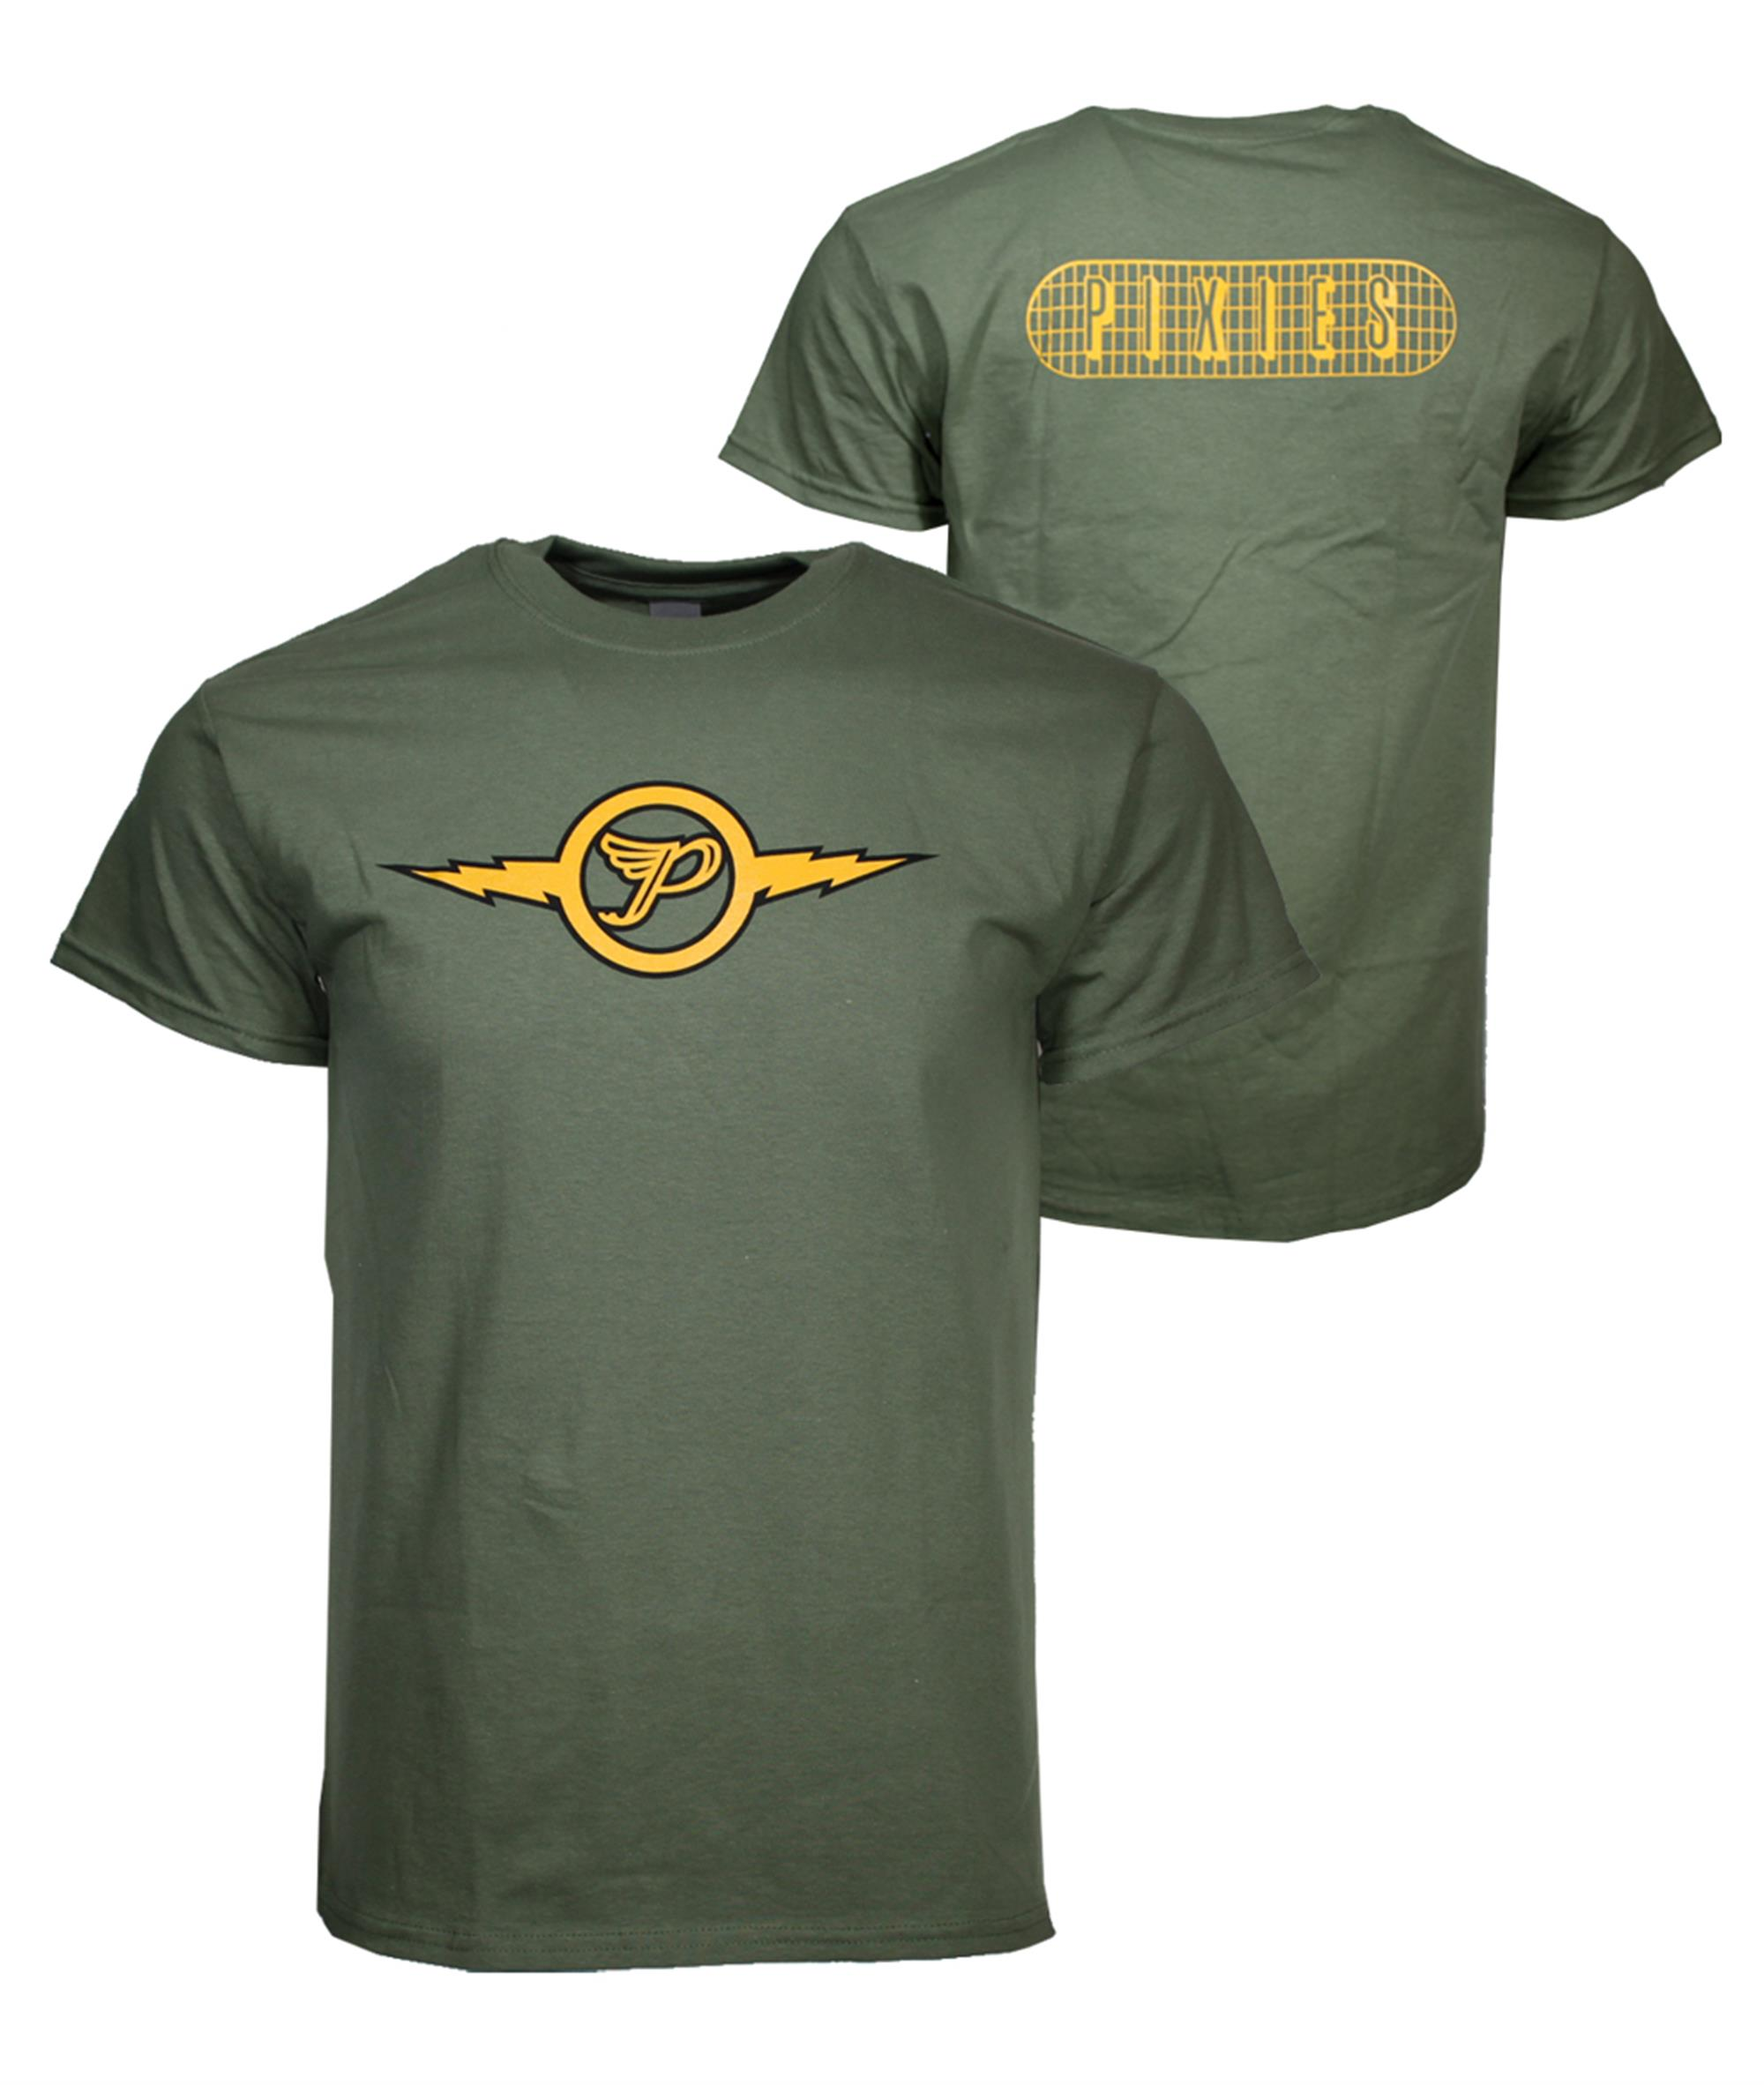 Pixies Lightning T-Shirt